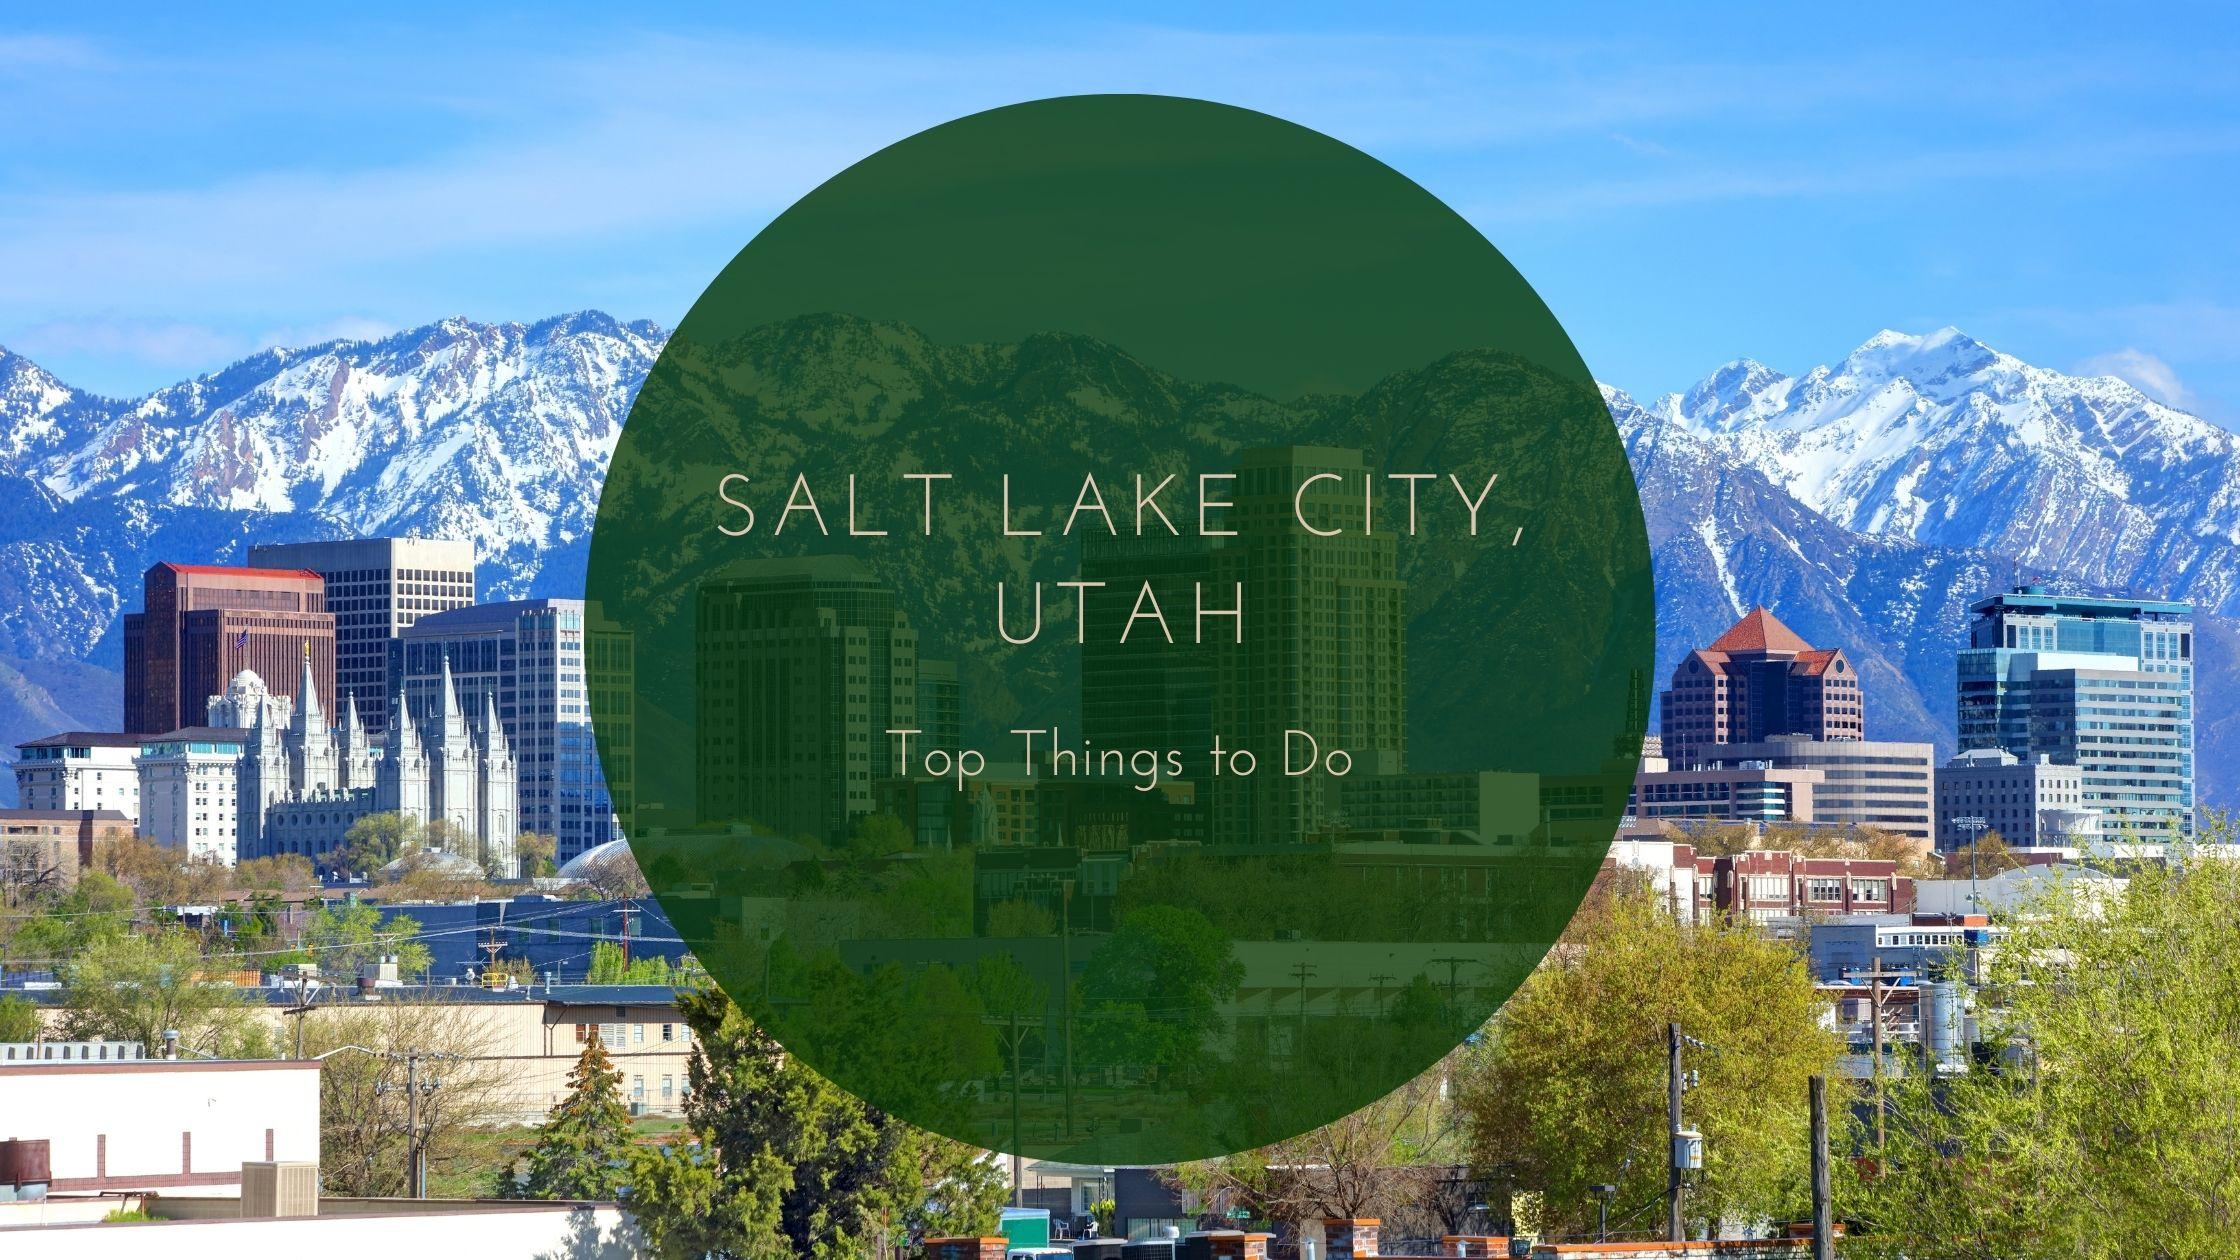 Top Things to Do in Salt Lake City, Utah